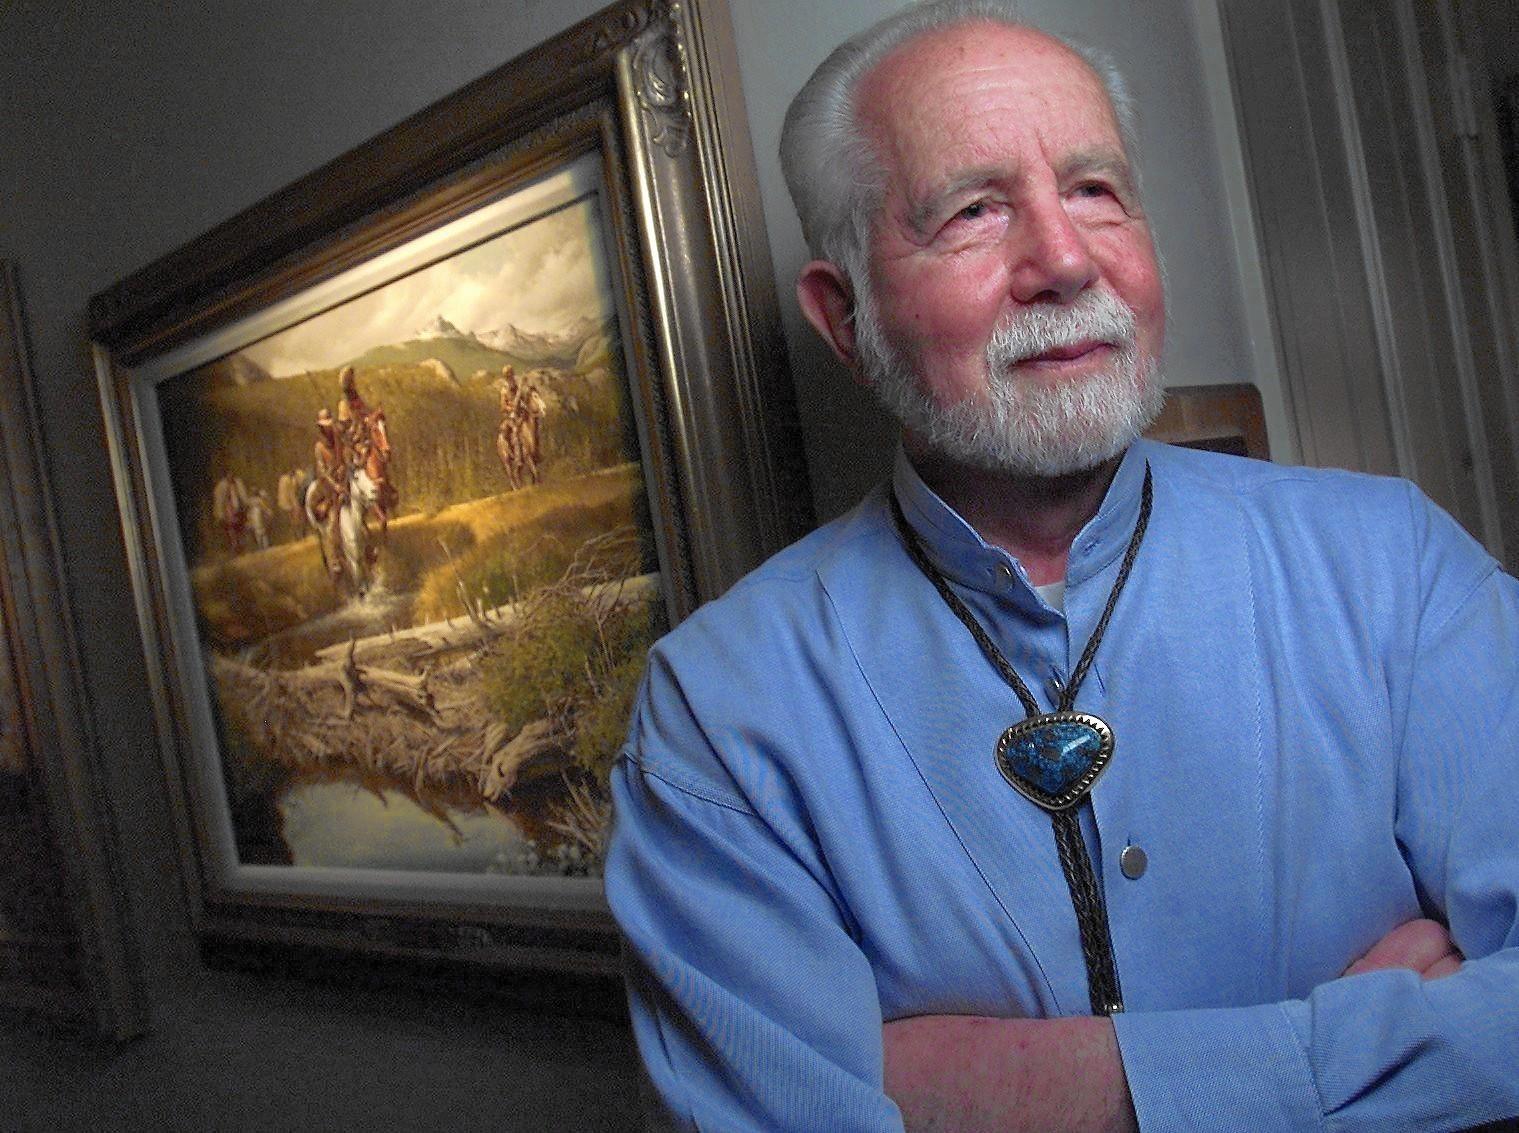 John J. Geraghty dies at 85; hot rod designer later became art expert